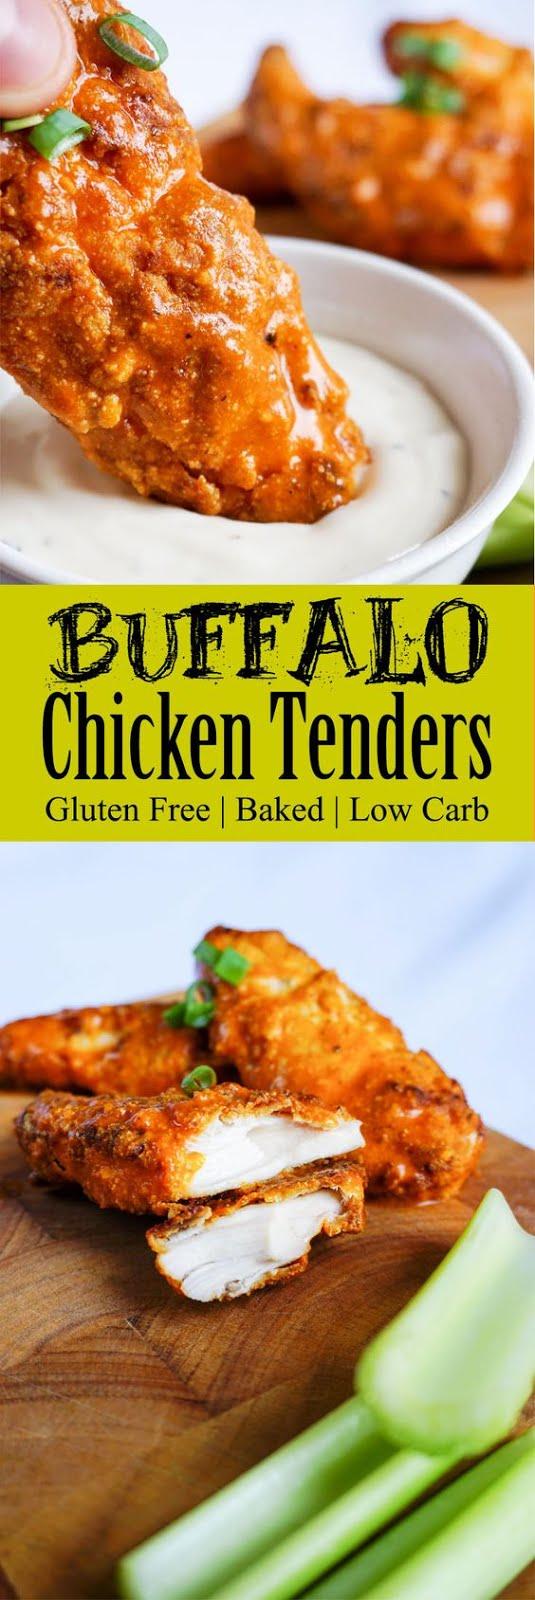 slow cooker cheesy salsa chicken 10 buffalo keto chicken tenders